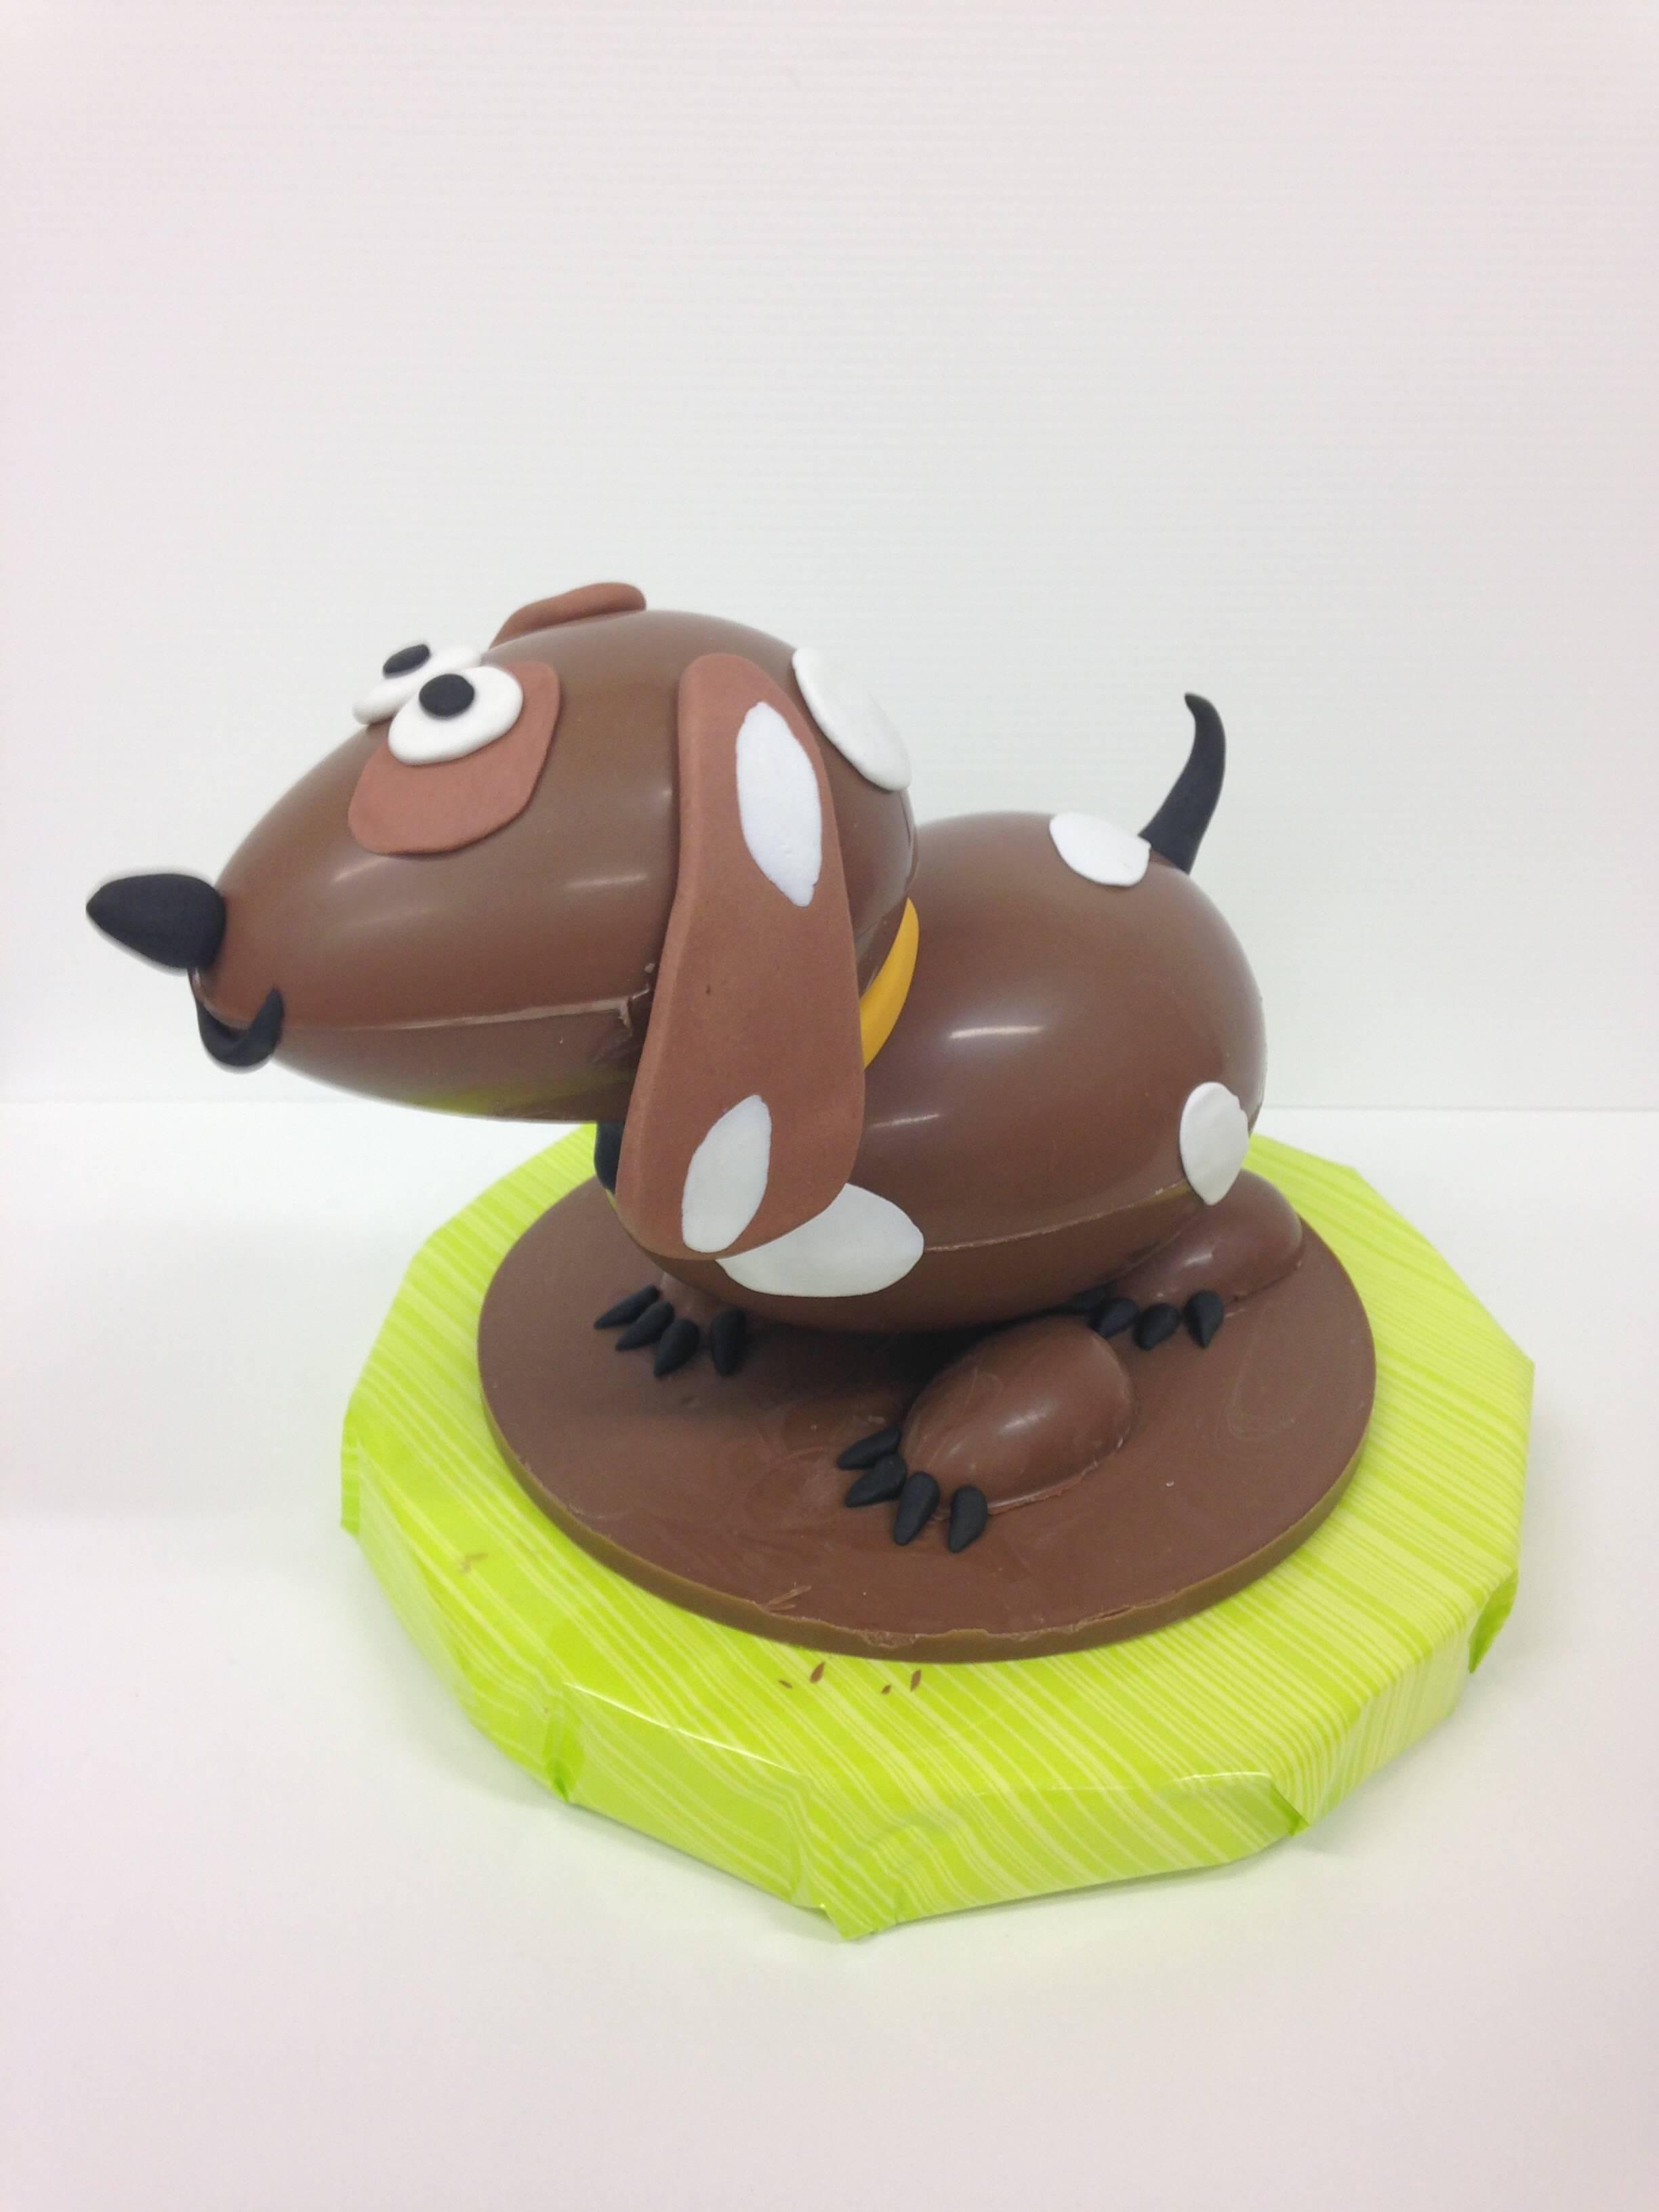 huevo de pascua figura de pascua chocolate perro coruña